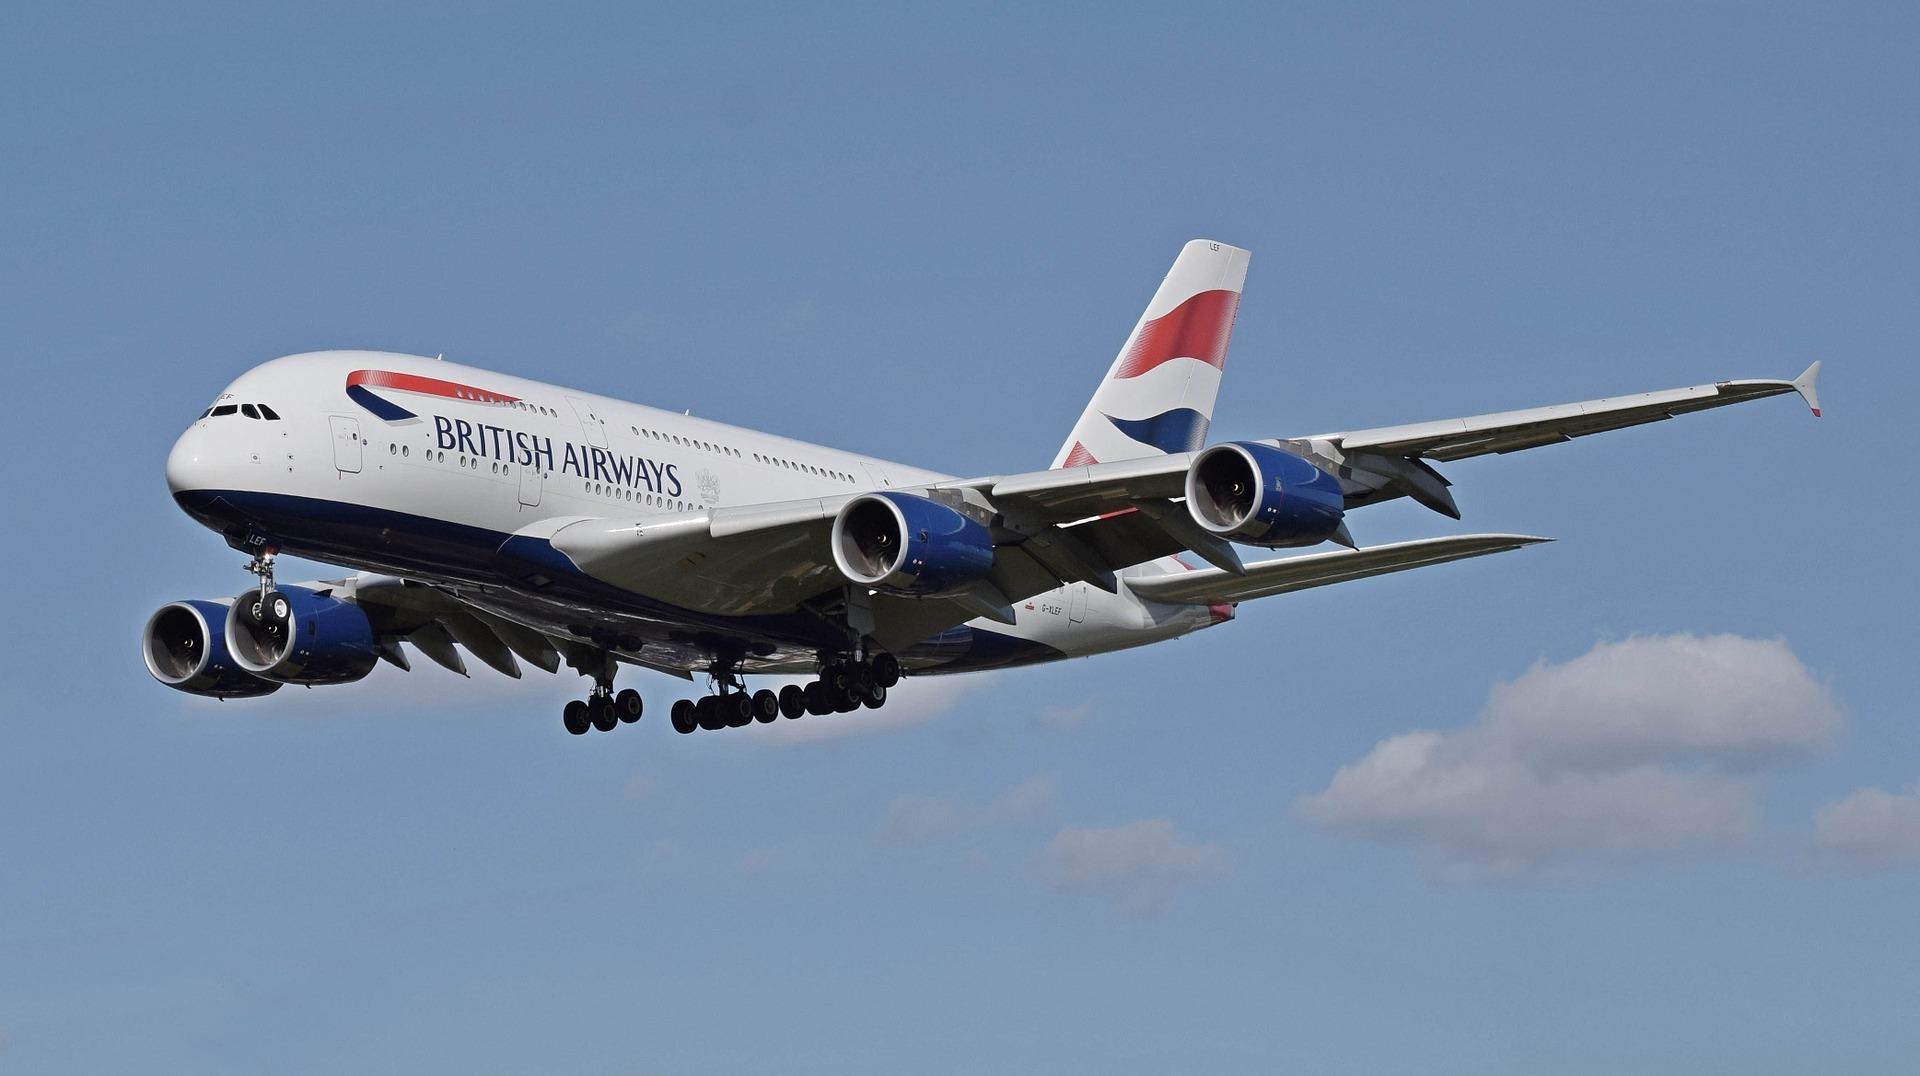 British Airways, a member of oneworld